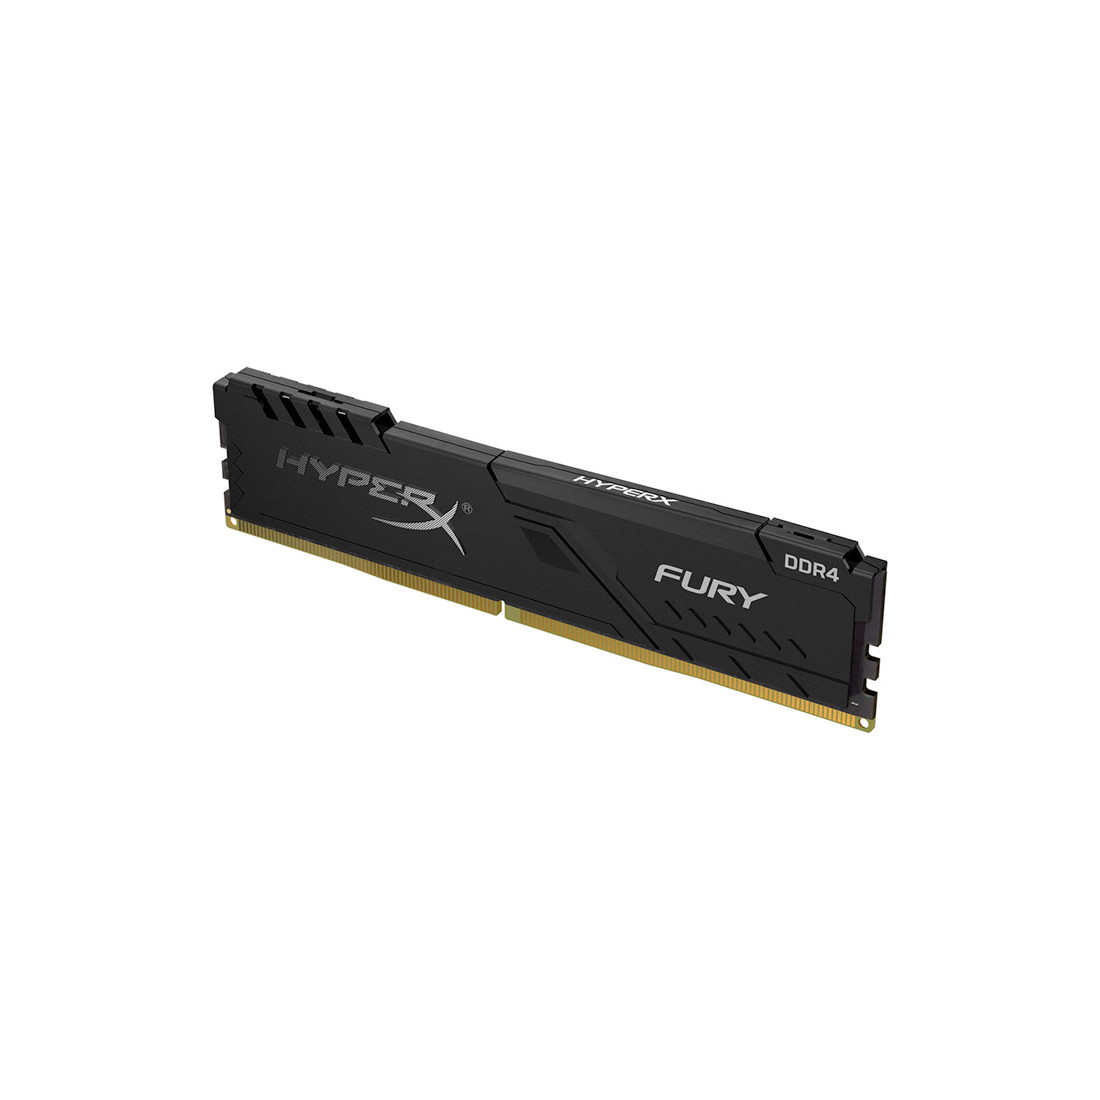 Модуль памяти Kingston HyperX Fury HX430C15FB3/16 (DDR4, 16GB, DIMM) - фото 1